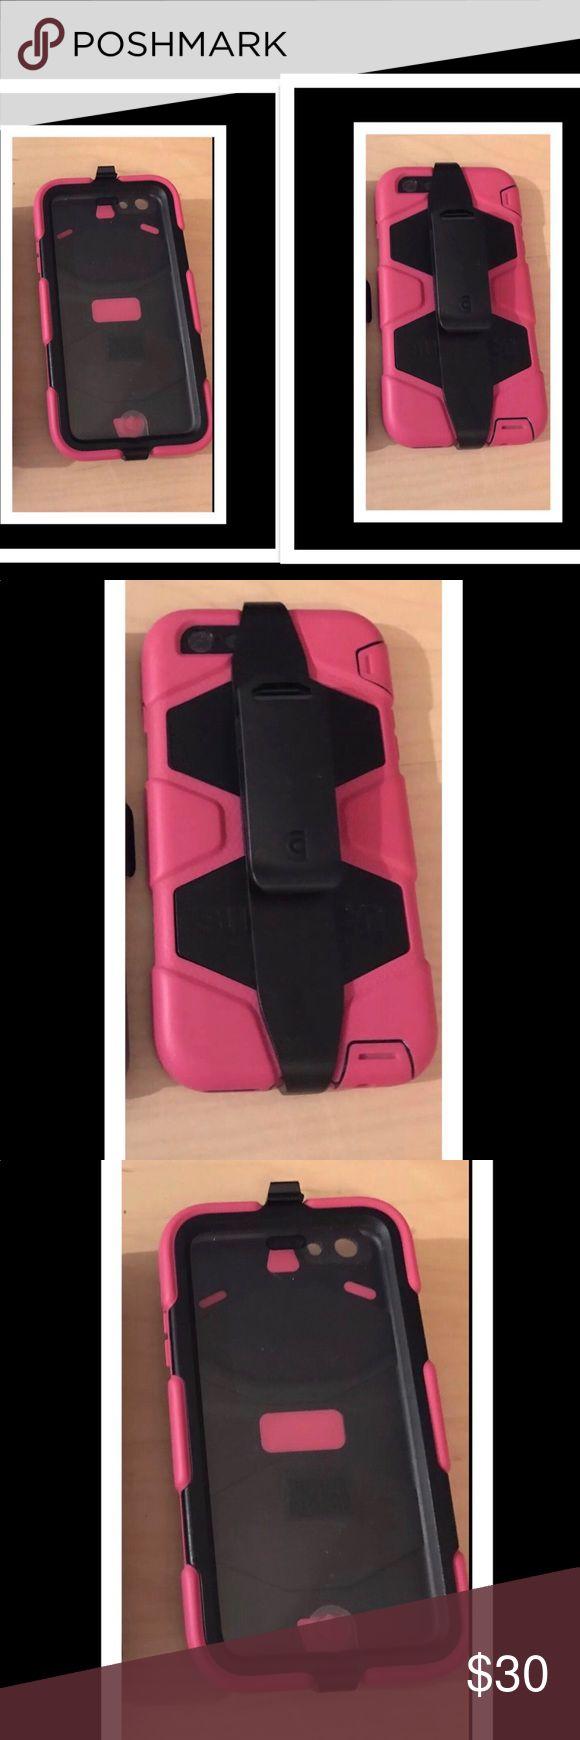 Pink & Black Survivor Case with Clip IPhone 6plus iPhone 6 Plus Phone Case  1 Pink & Black Survivor Case with Clip   Pre Owned  Looks brand new Survivor Accessories Phone Cases